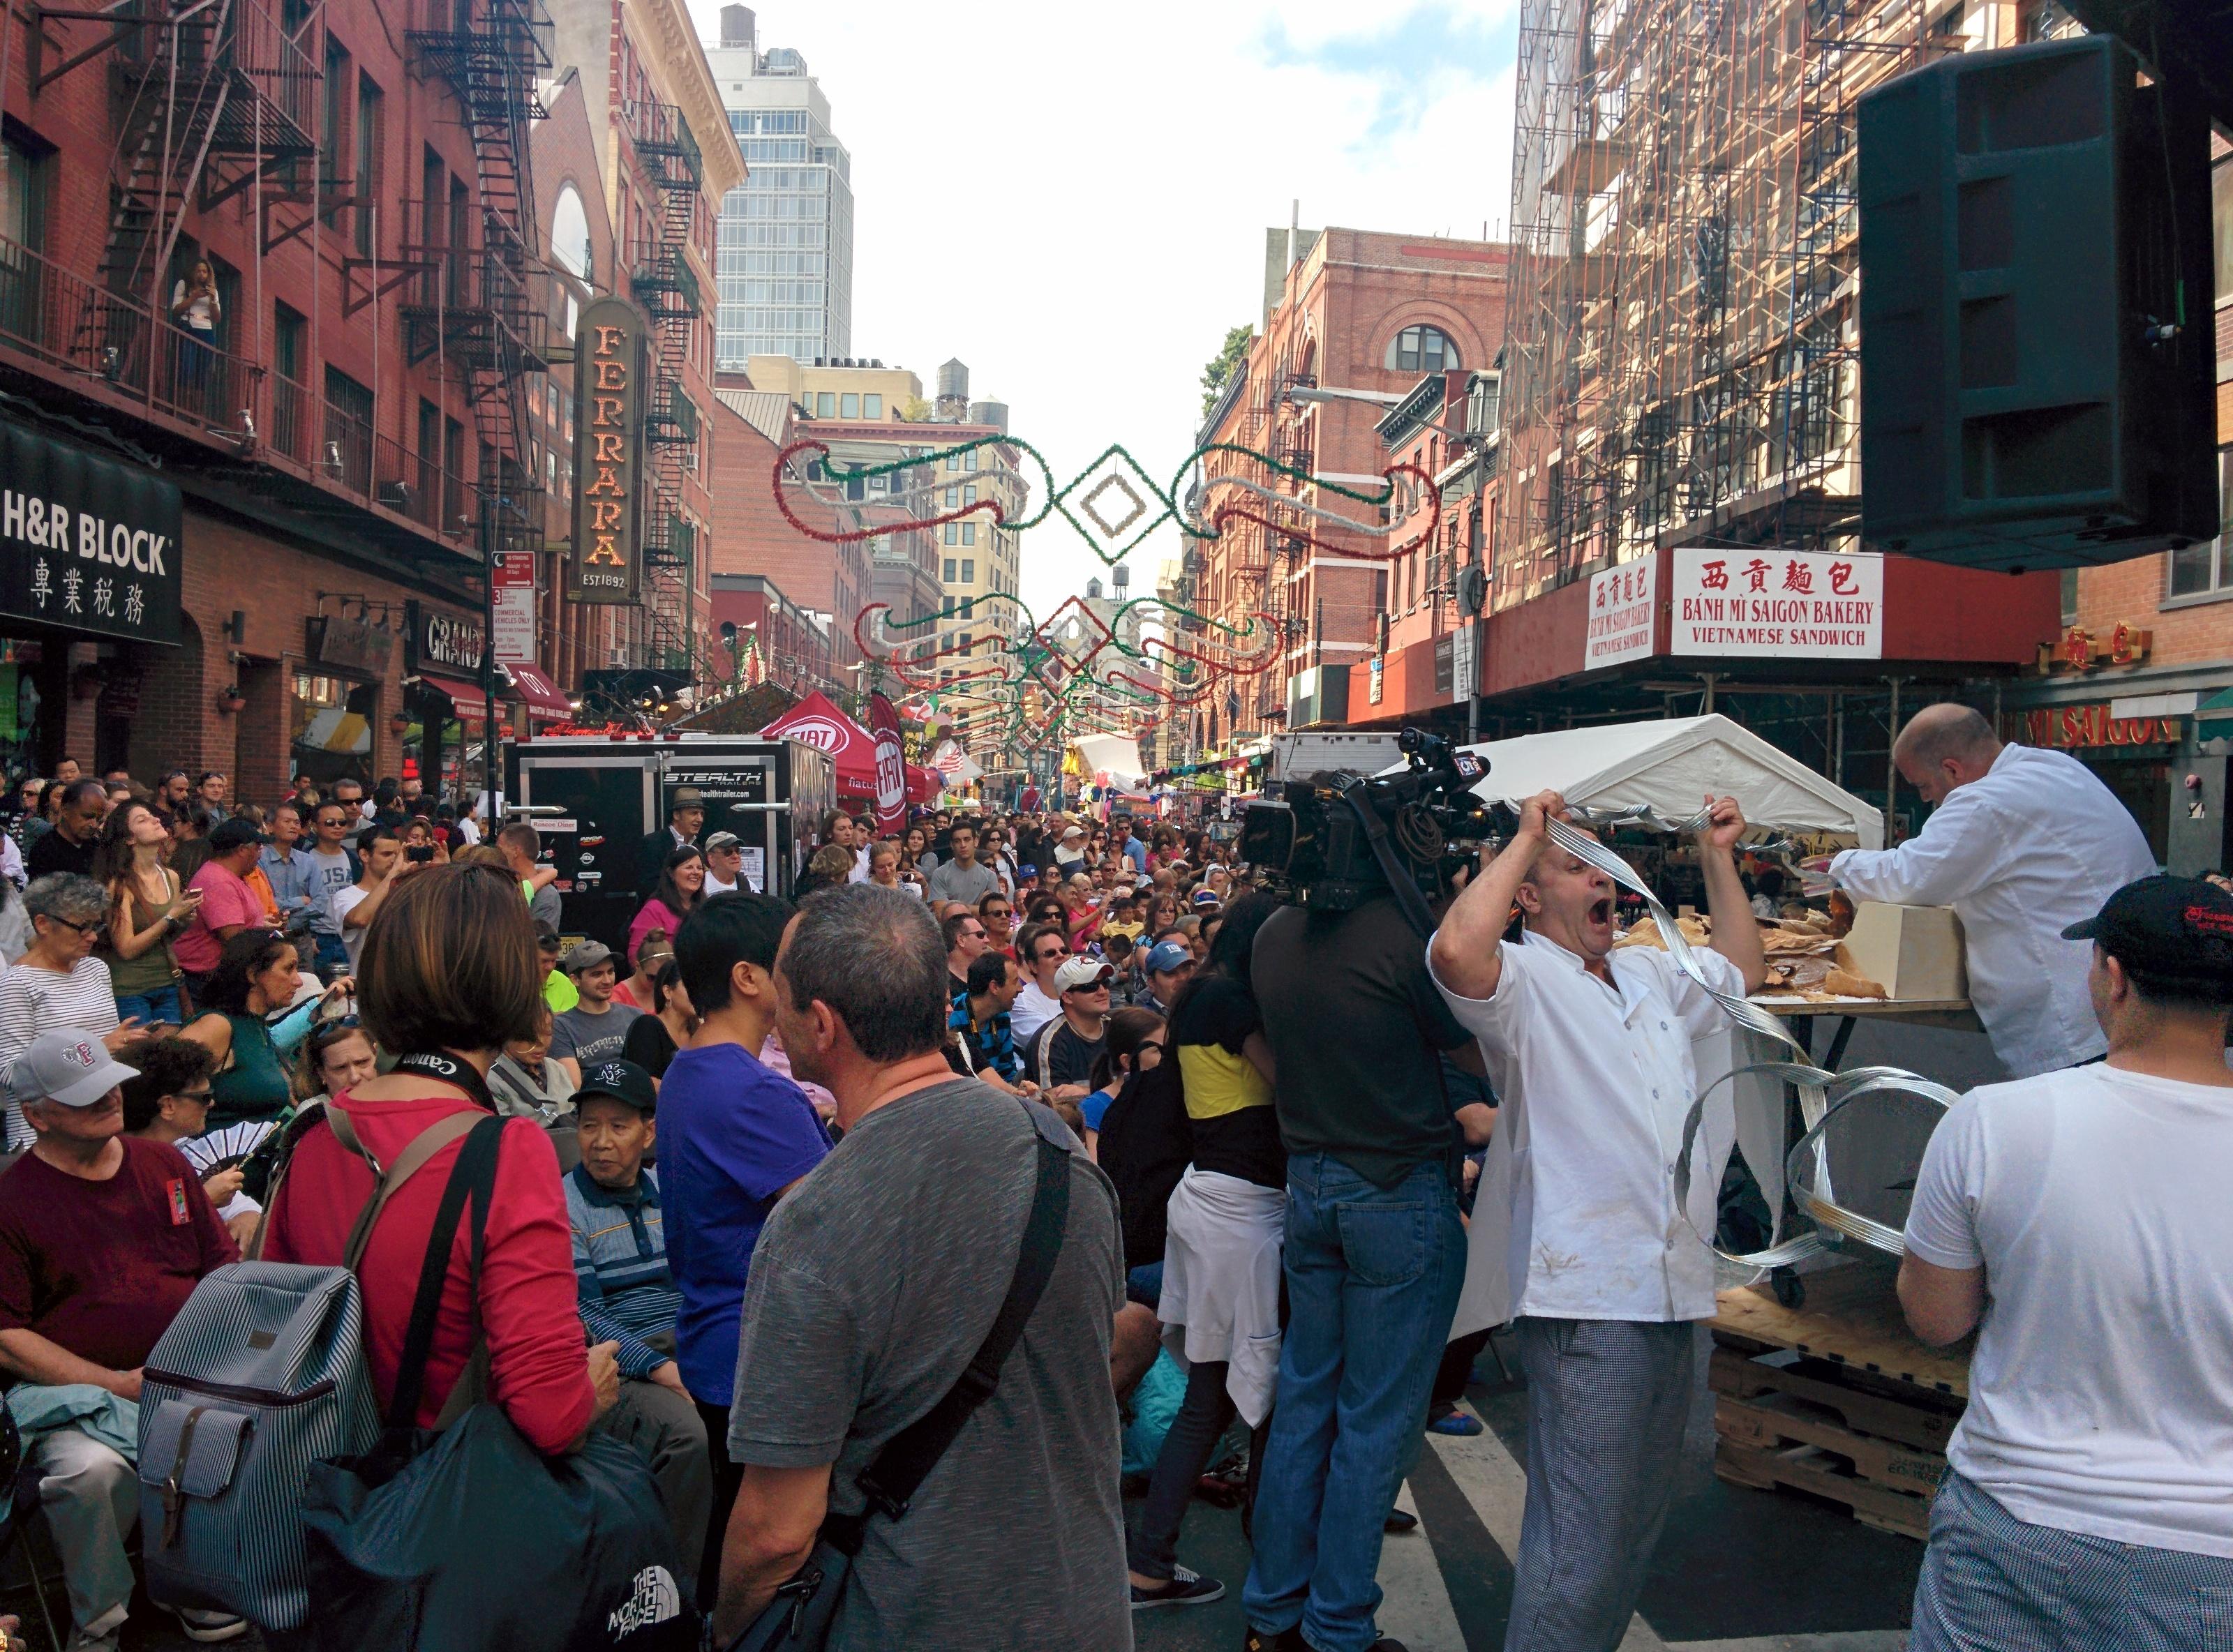 San Gennaro Festival New York 2020.Feast Of San Gennaro Wikipedia